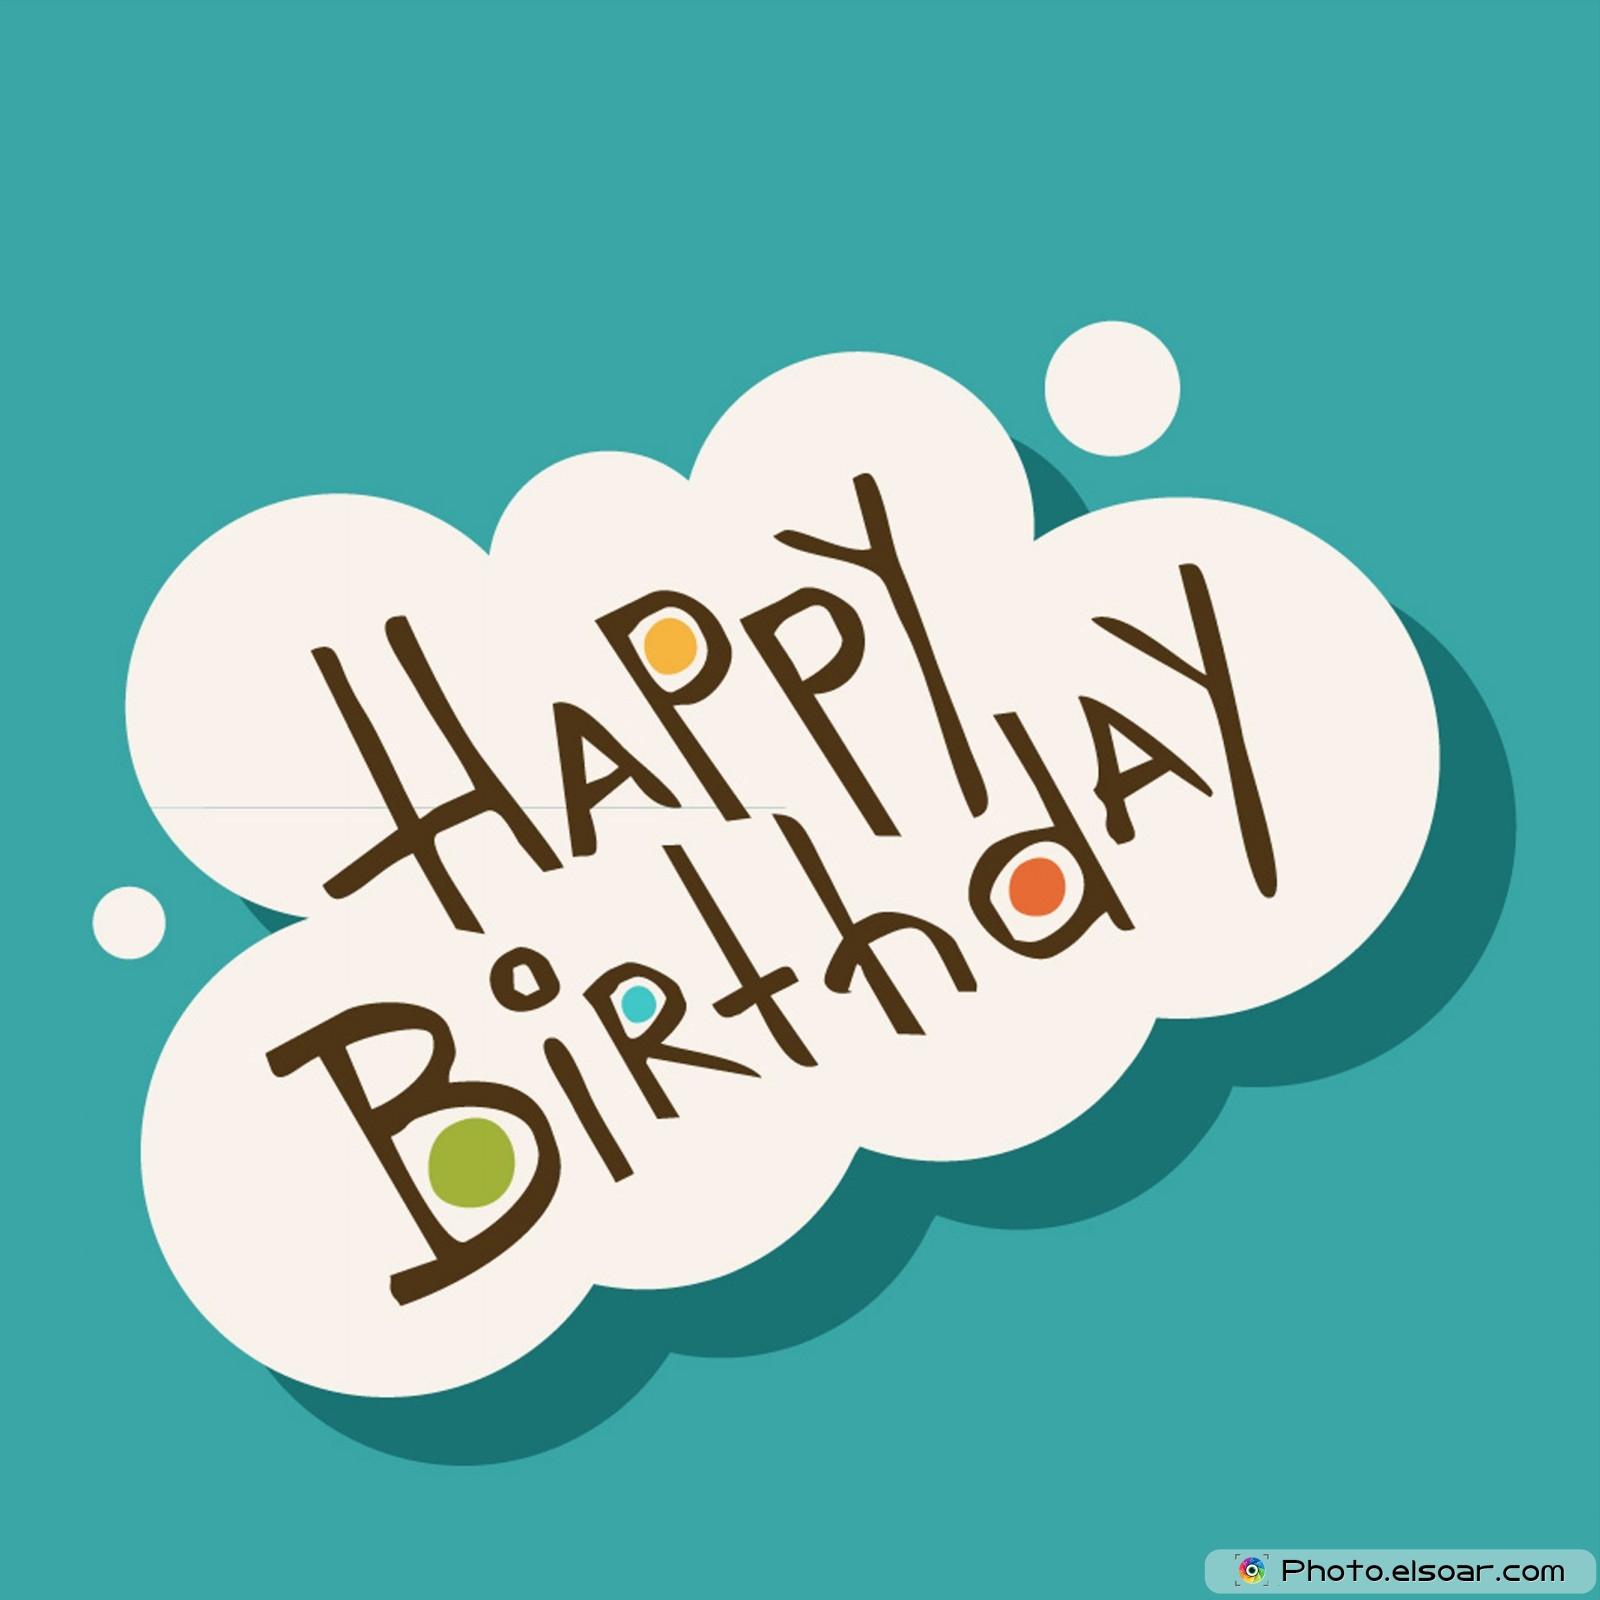 Shinybirthdaycarddesignjpg 1600 1600 HBD – Birthday Card Design